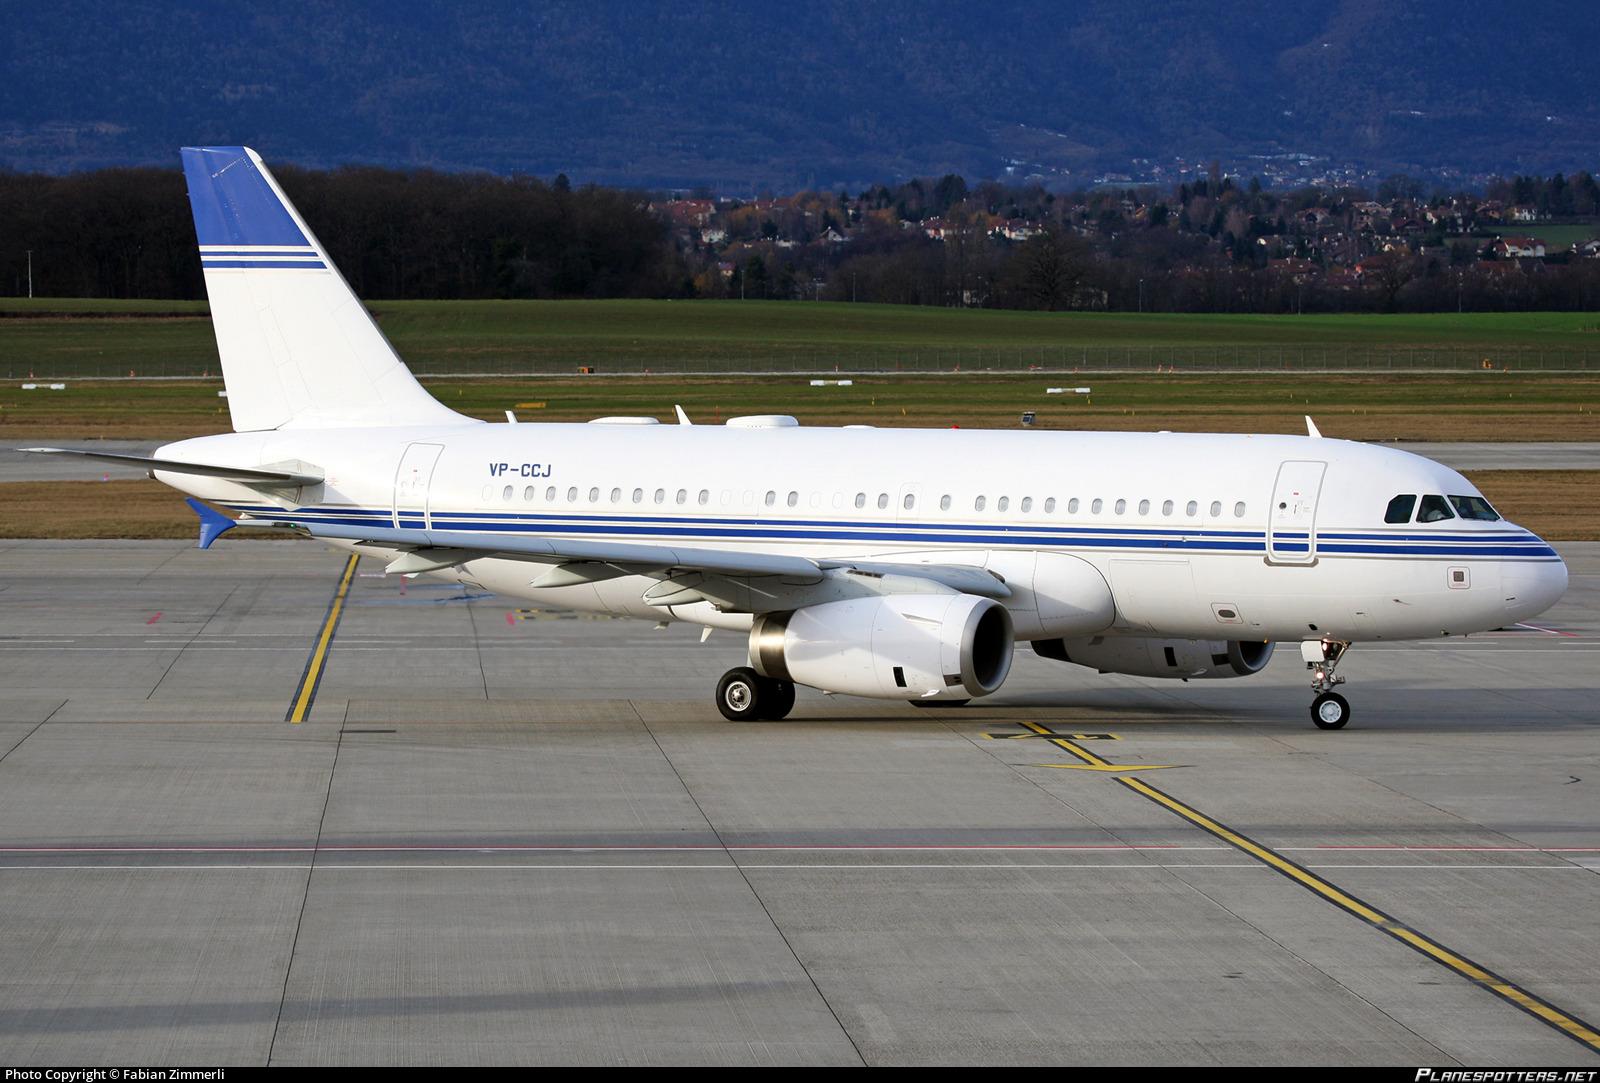 vp ccj jet aviation business jets airbus a319 133cj PlanespottersNet 855922 2f81526db3 o - A319CJ Corporate Jetliner